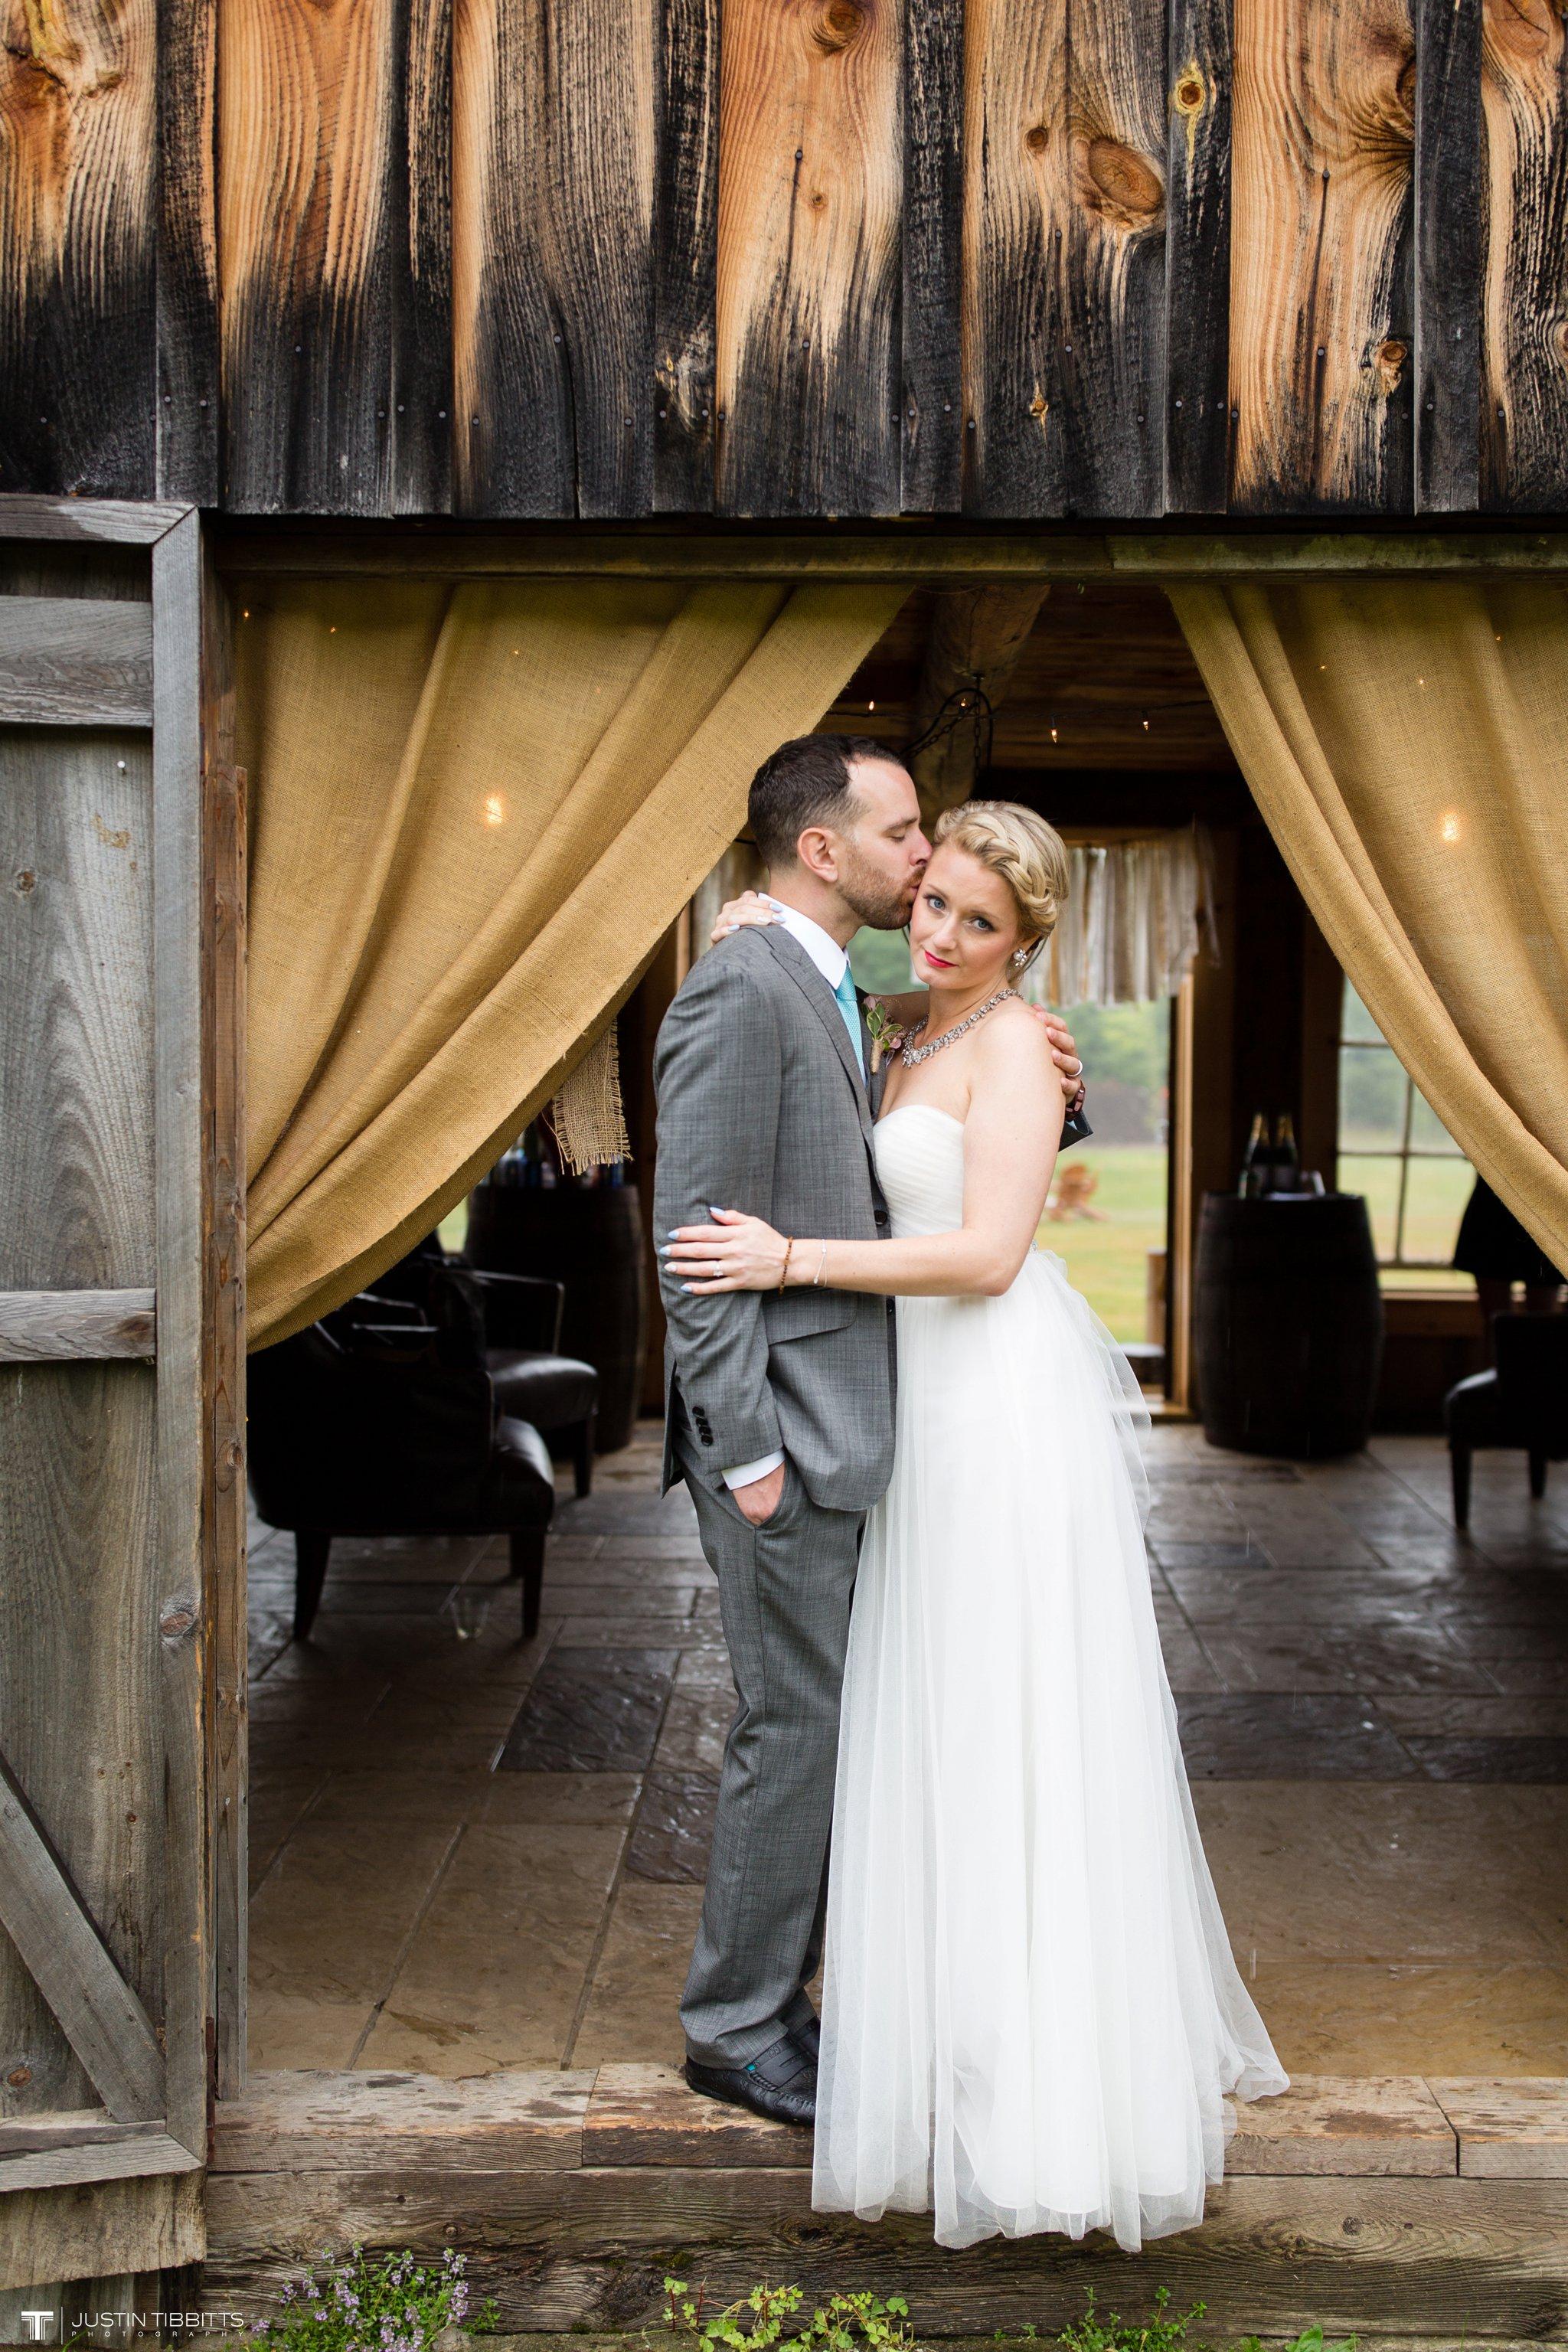 burlap-and-beams-wedding-photos-with-joran-and-molly_0085